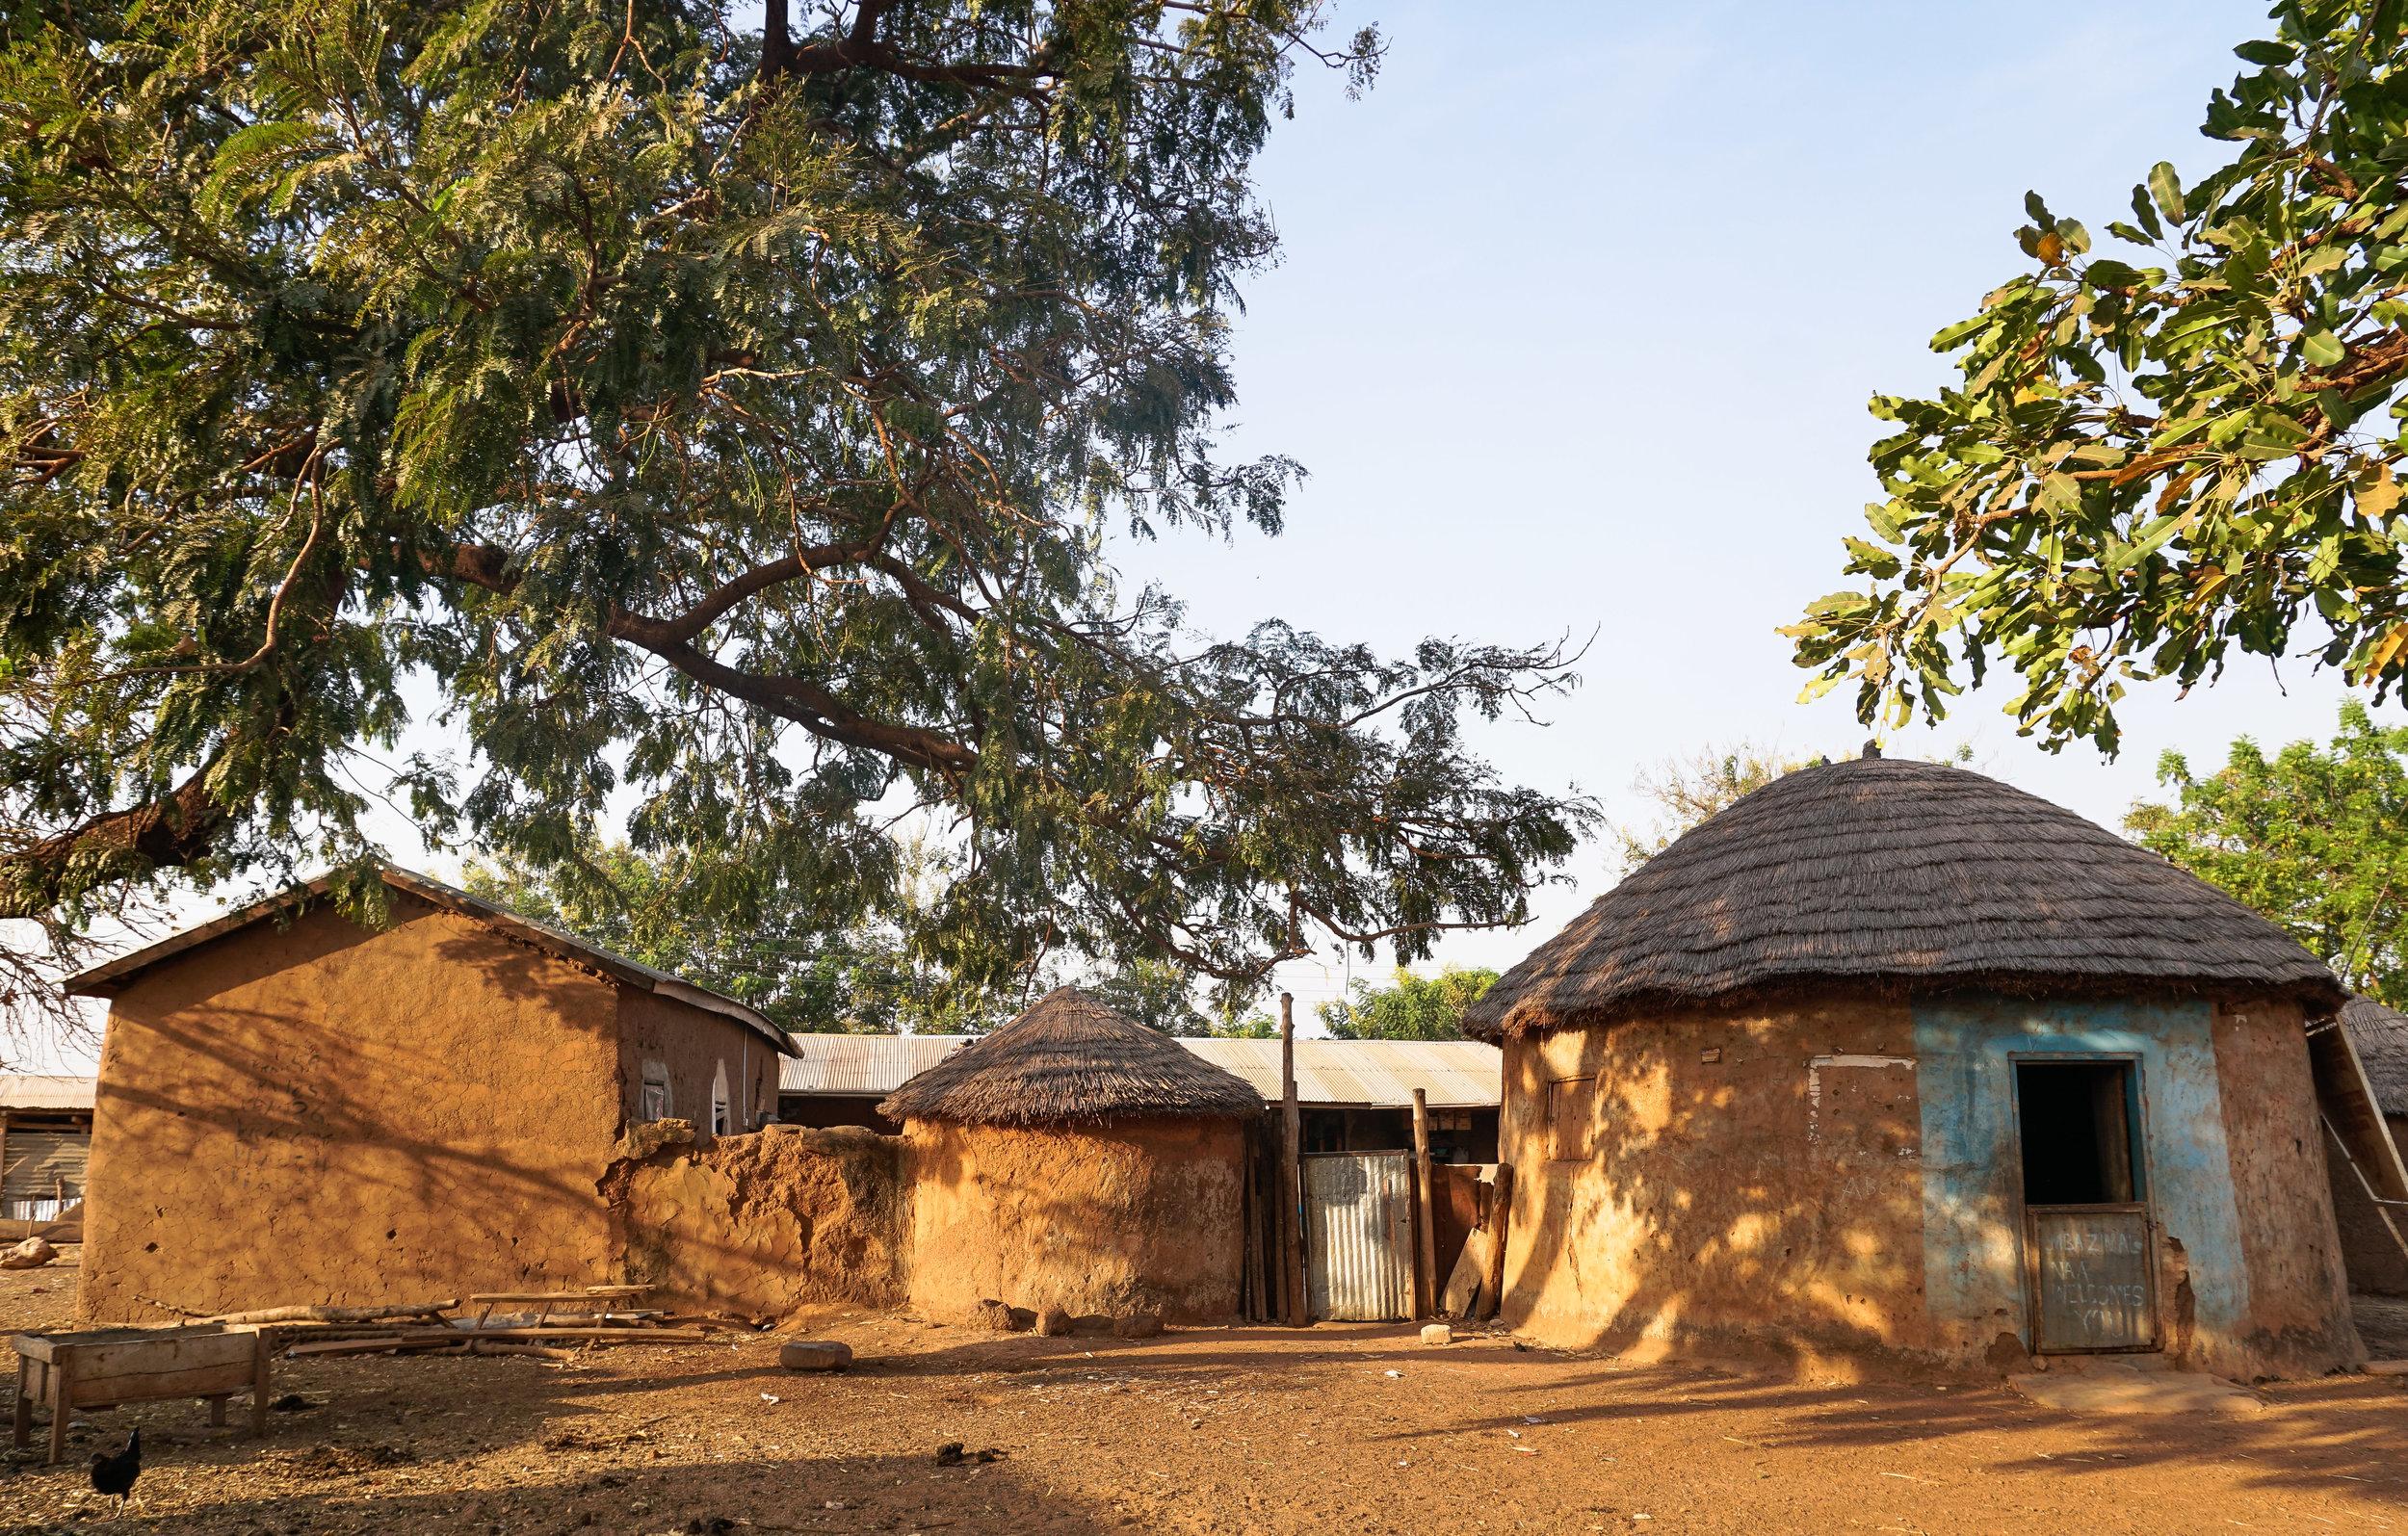 curio.trips.ghana.village.compound.sun.landscape.jpg